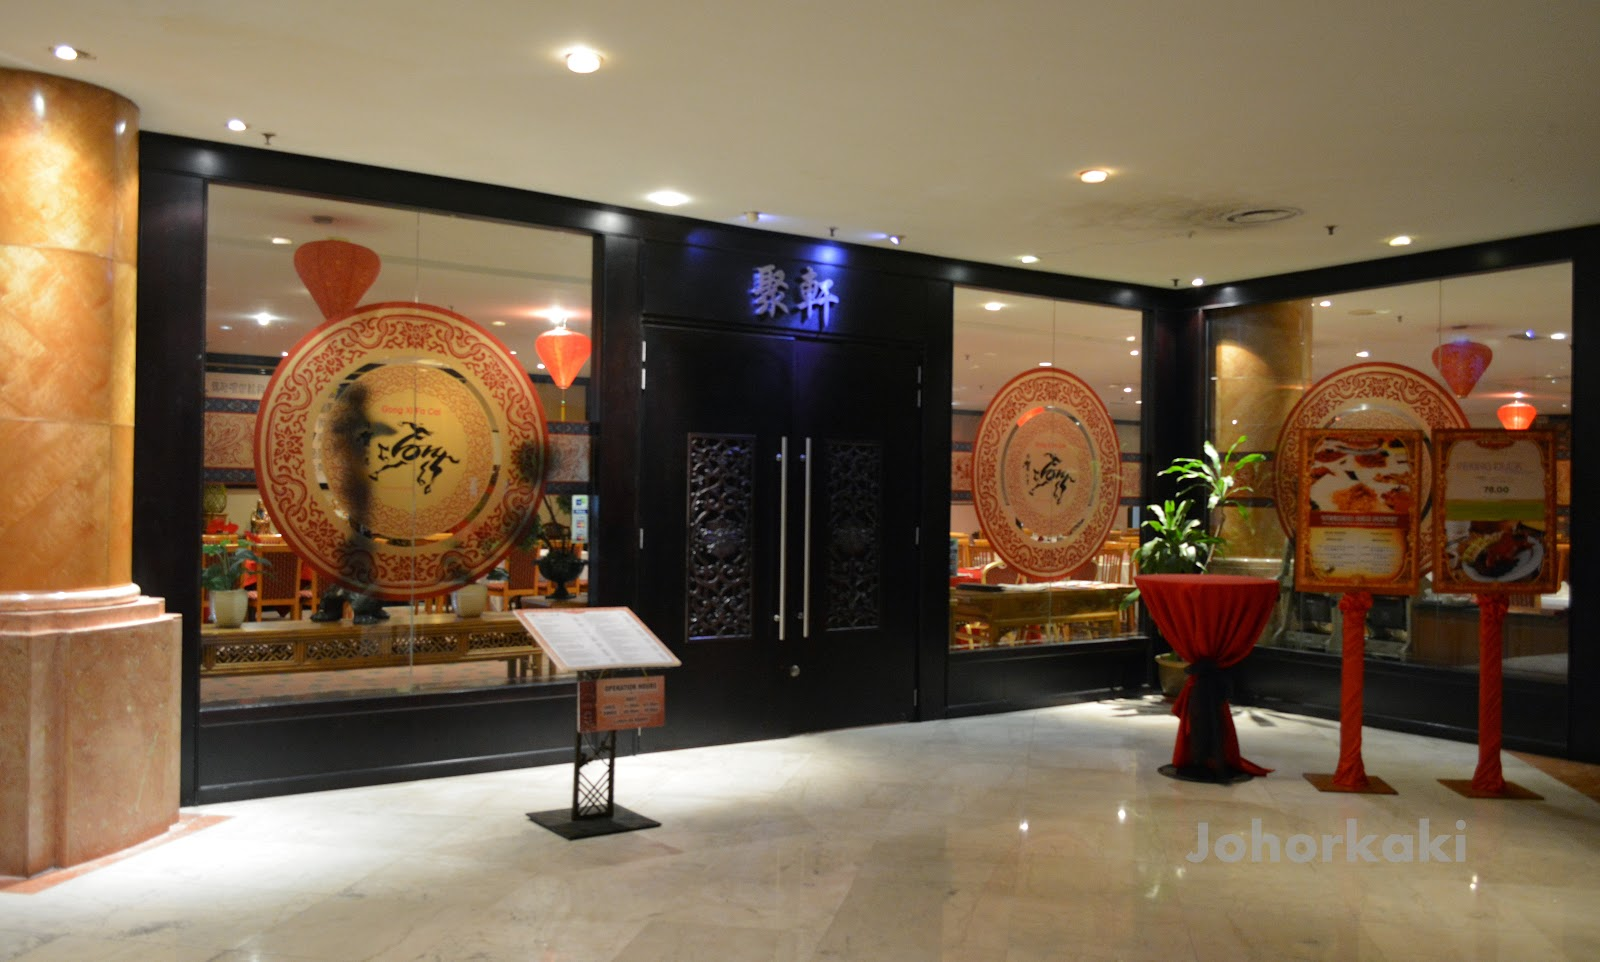 Berjaya waterfront hotel chinese restaurant johor bahru for Asian cuisine restaurant names